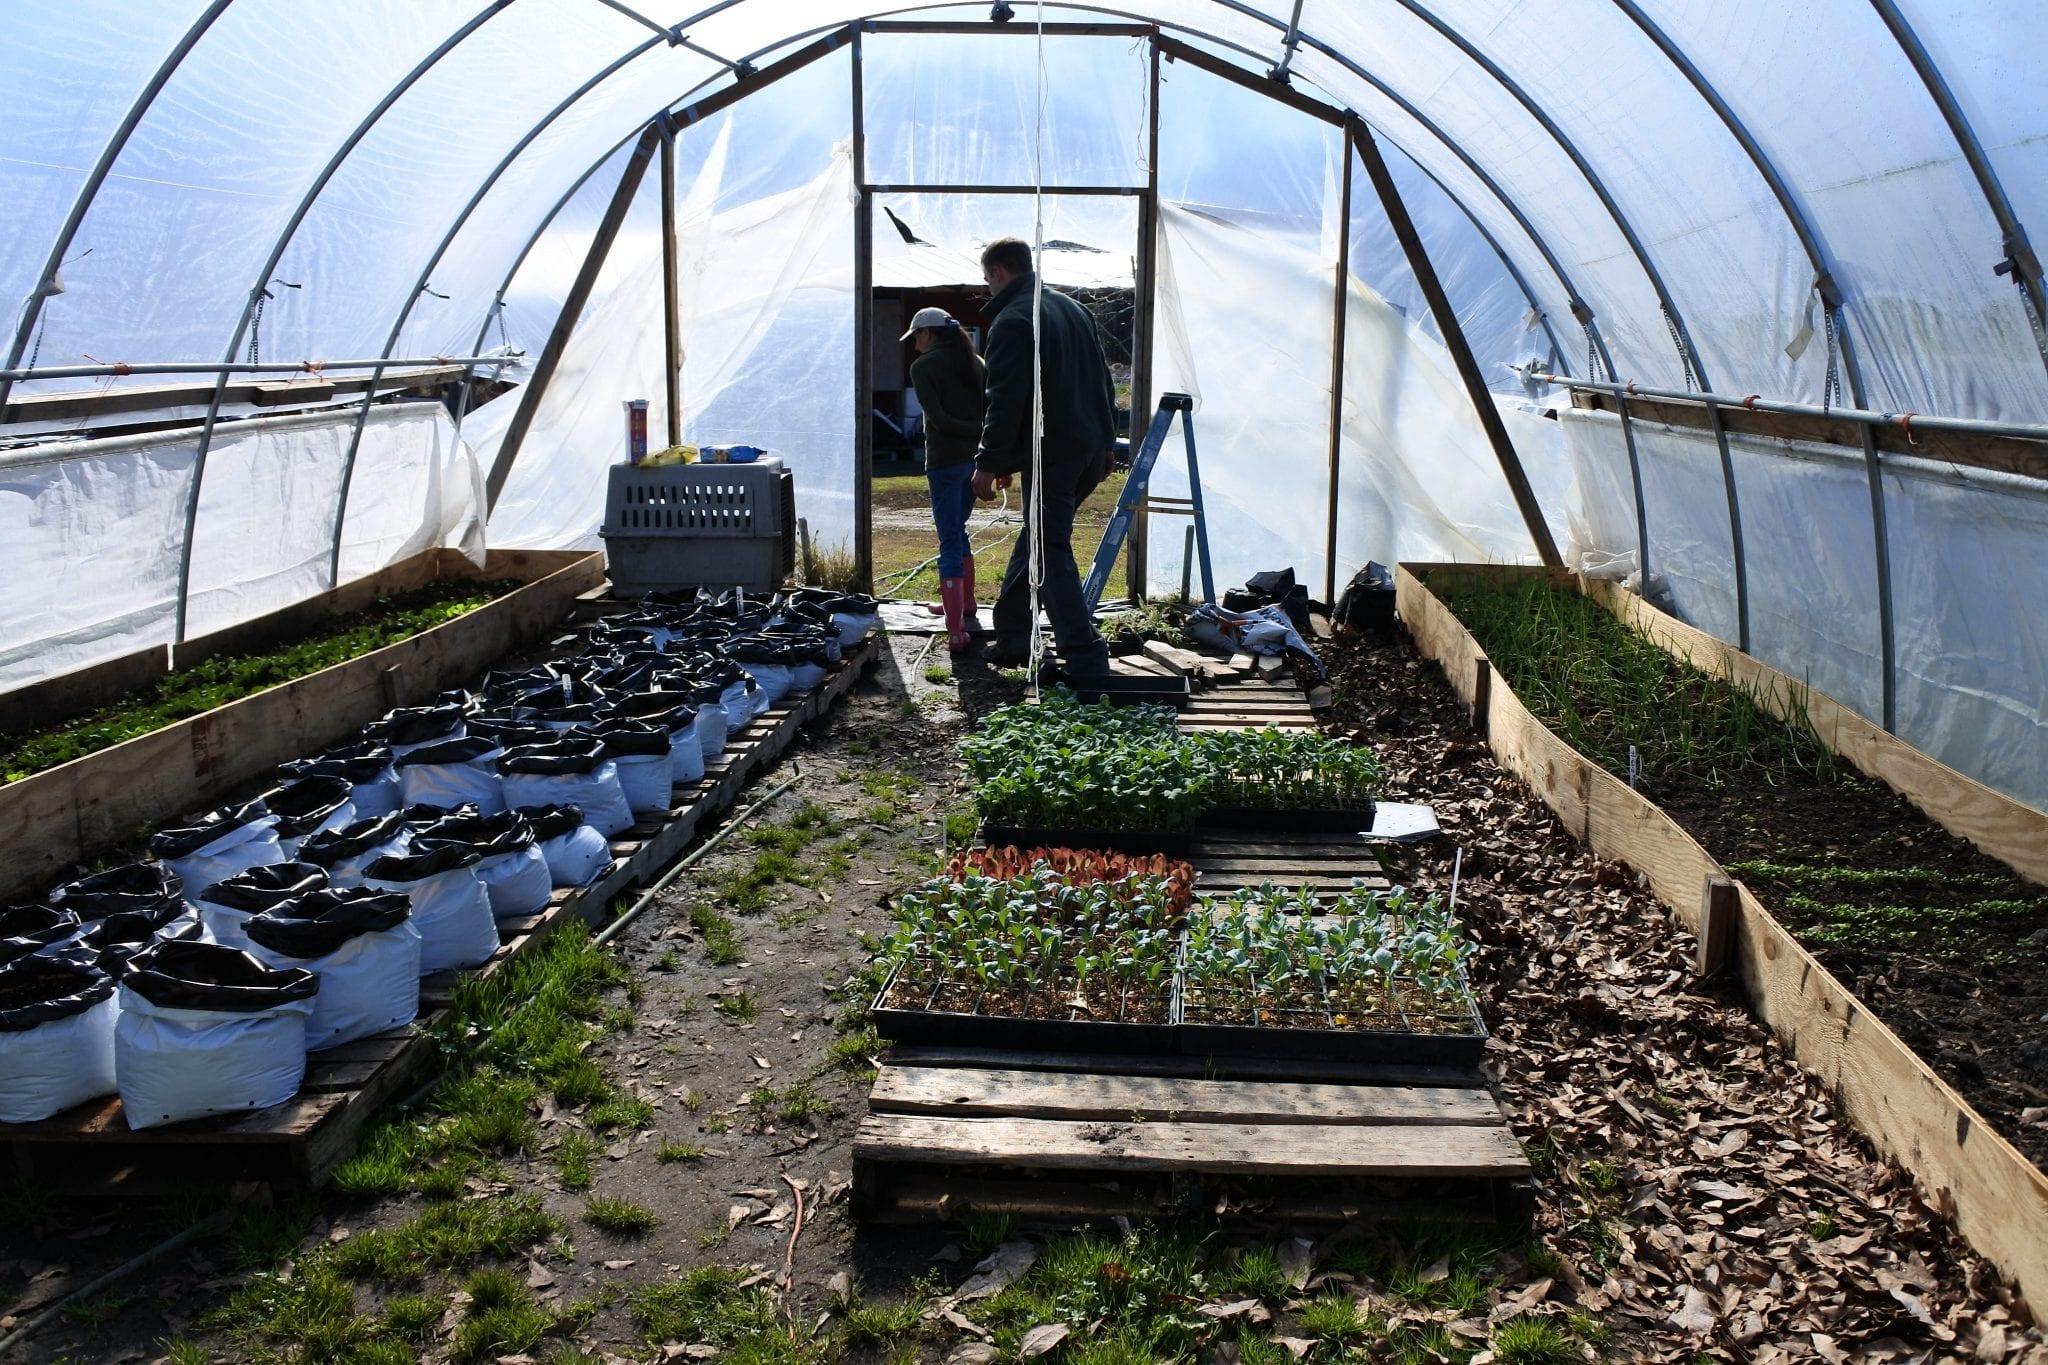 organic farm north carolina sustainability sustainable non-gmo small business grant startup agriculture